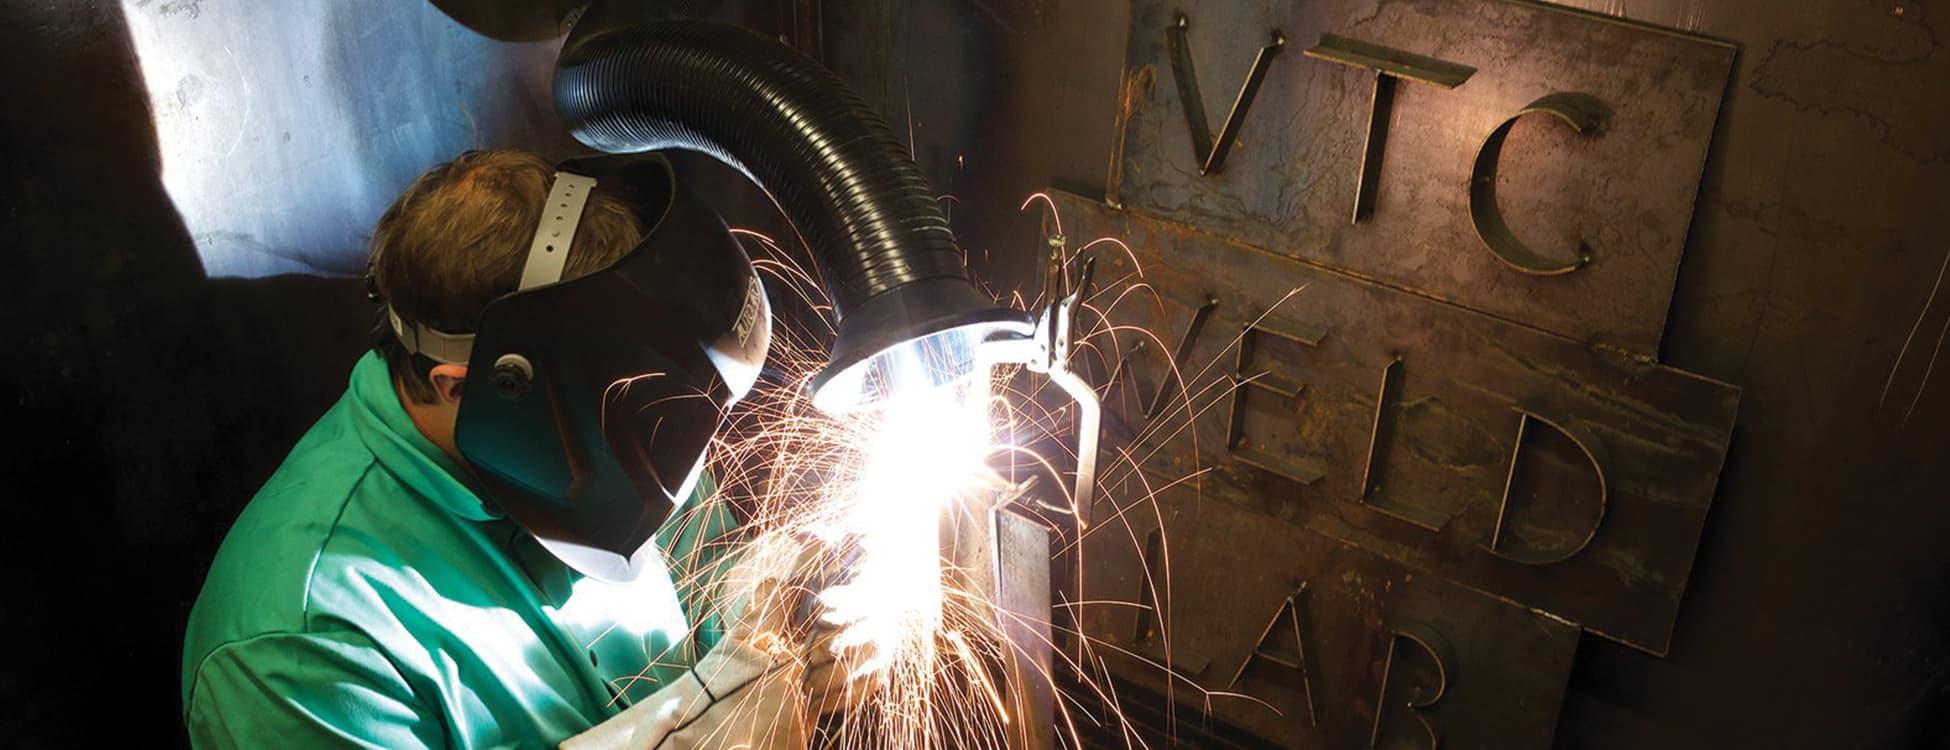 welding, student, laboratory